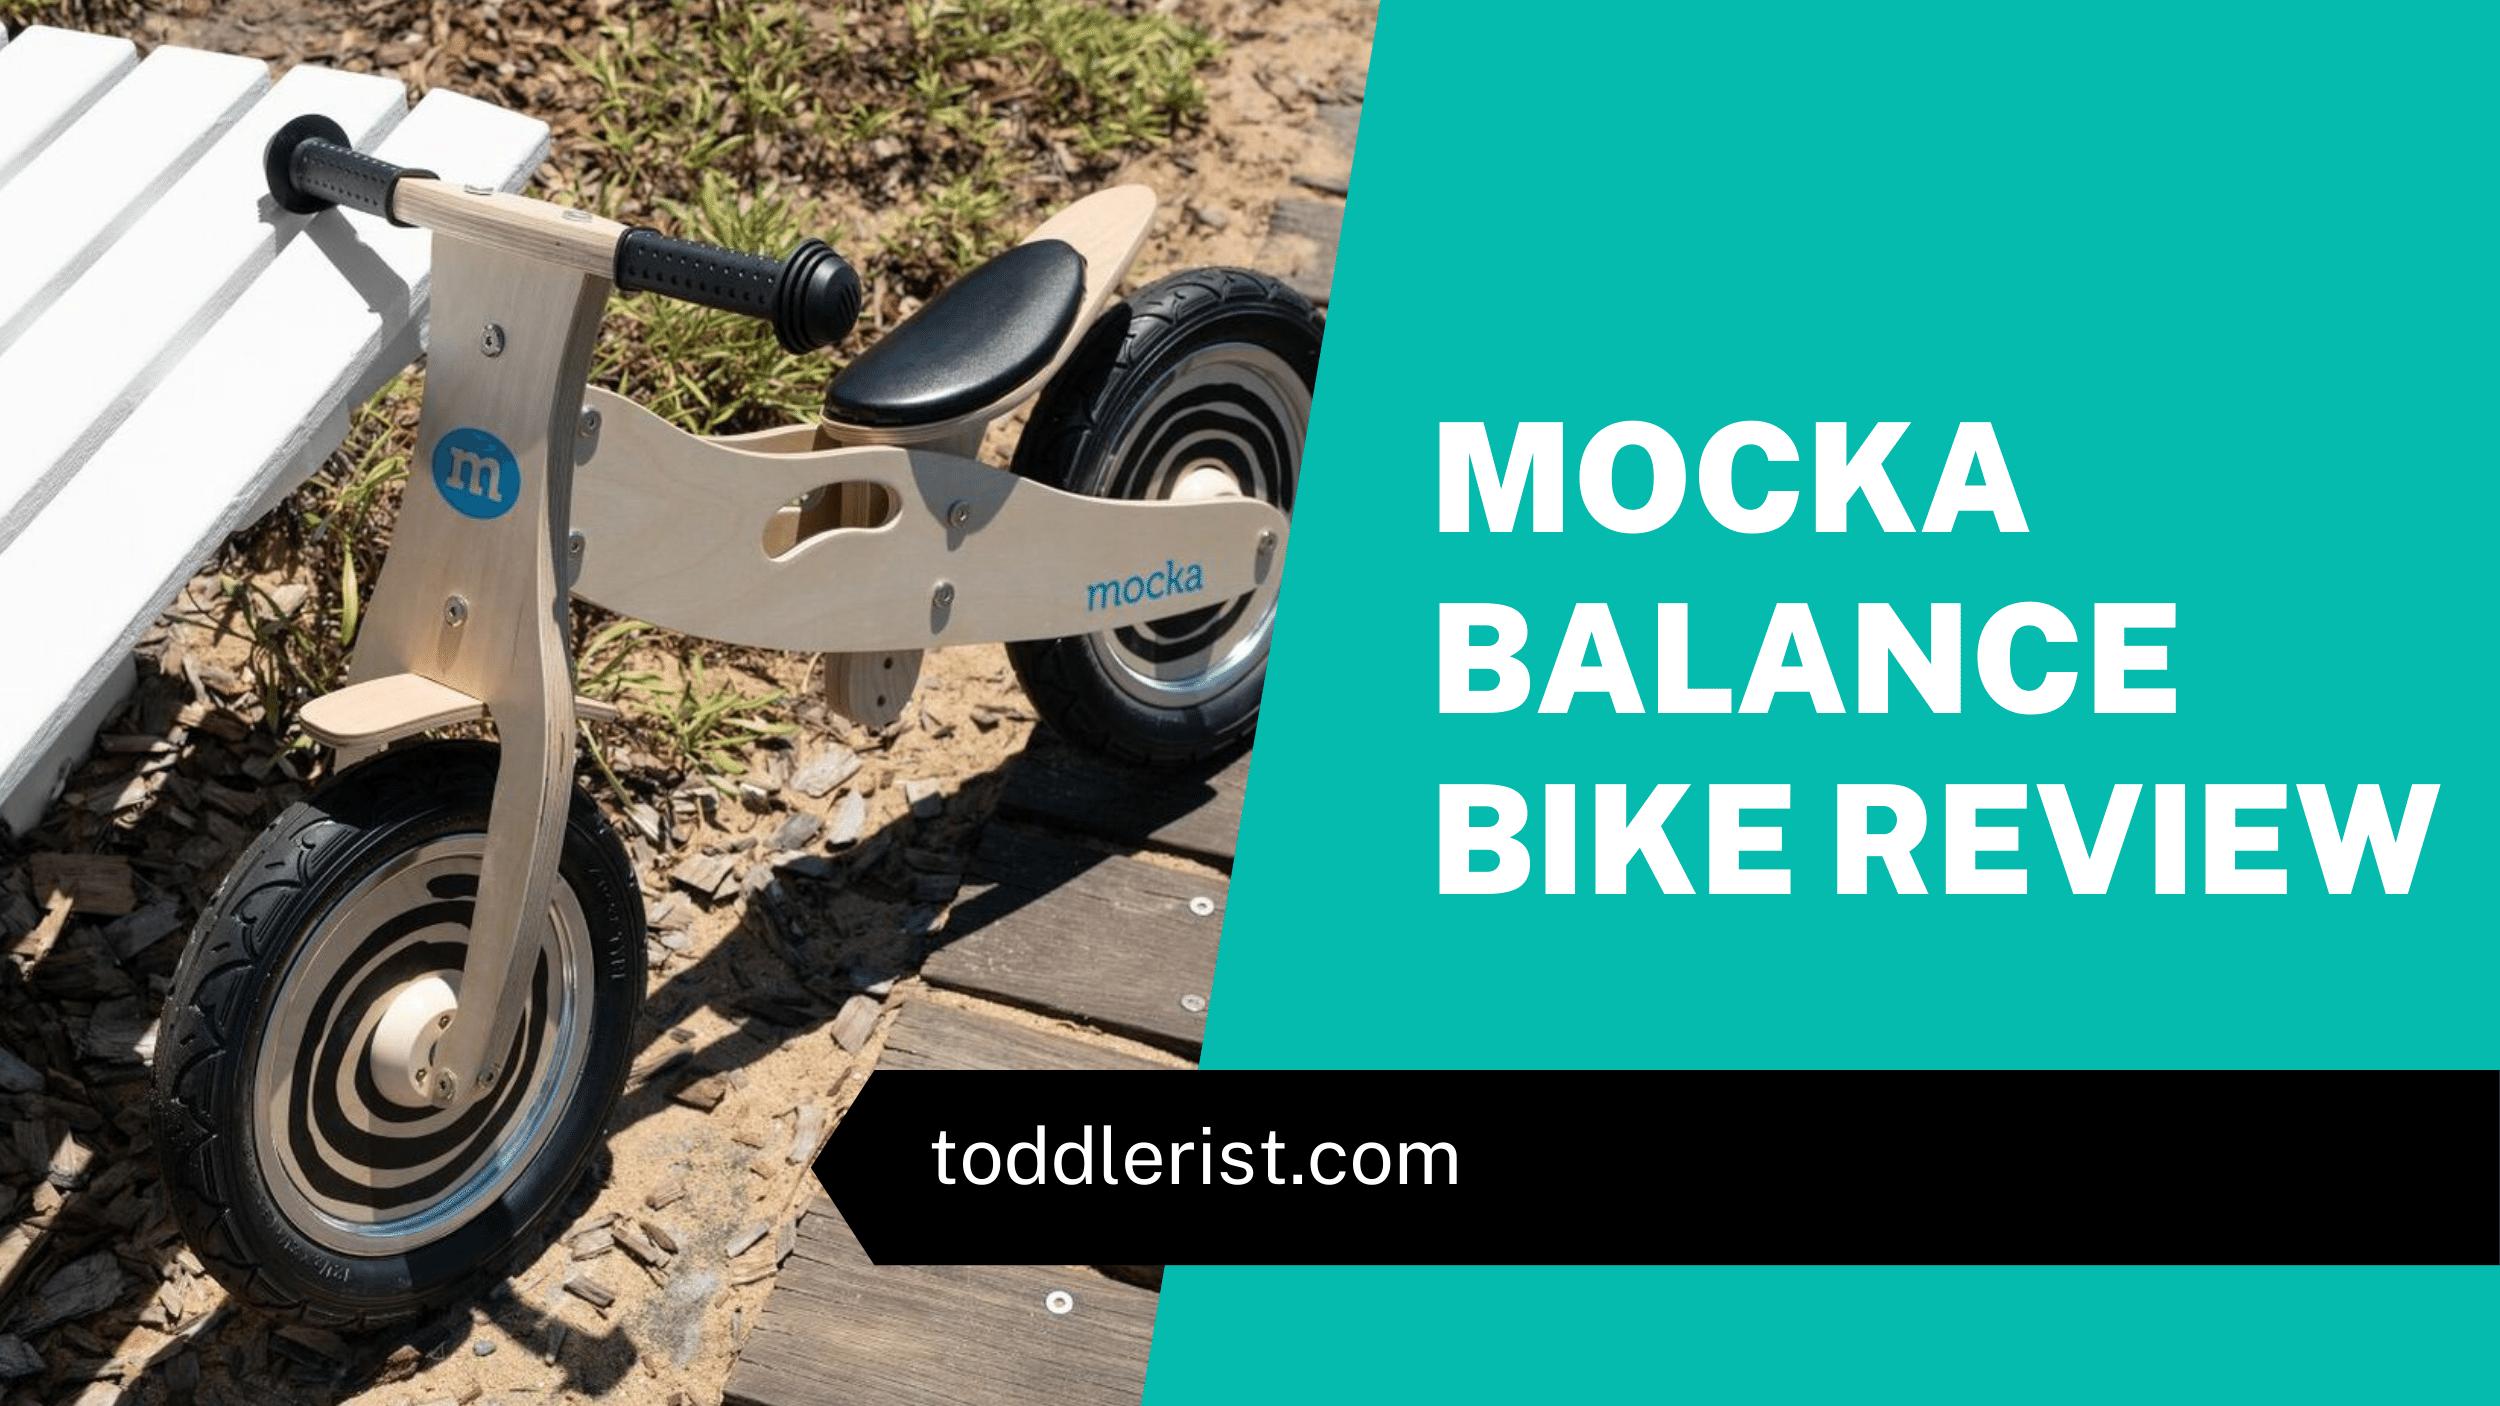 Mocka Balance Bike Review